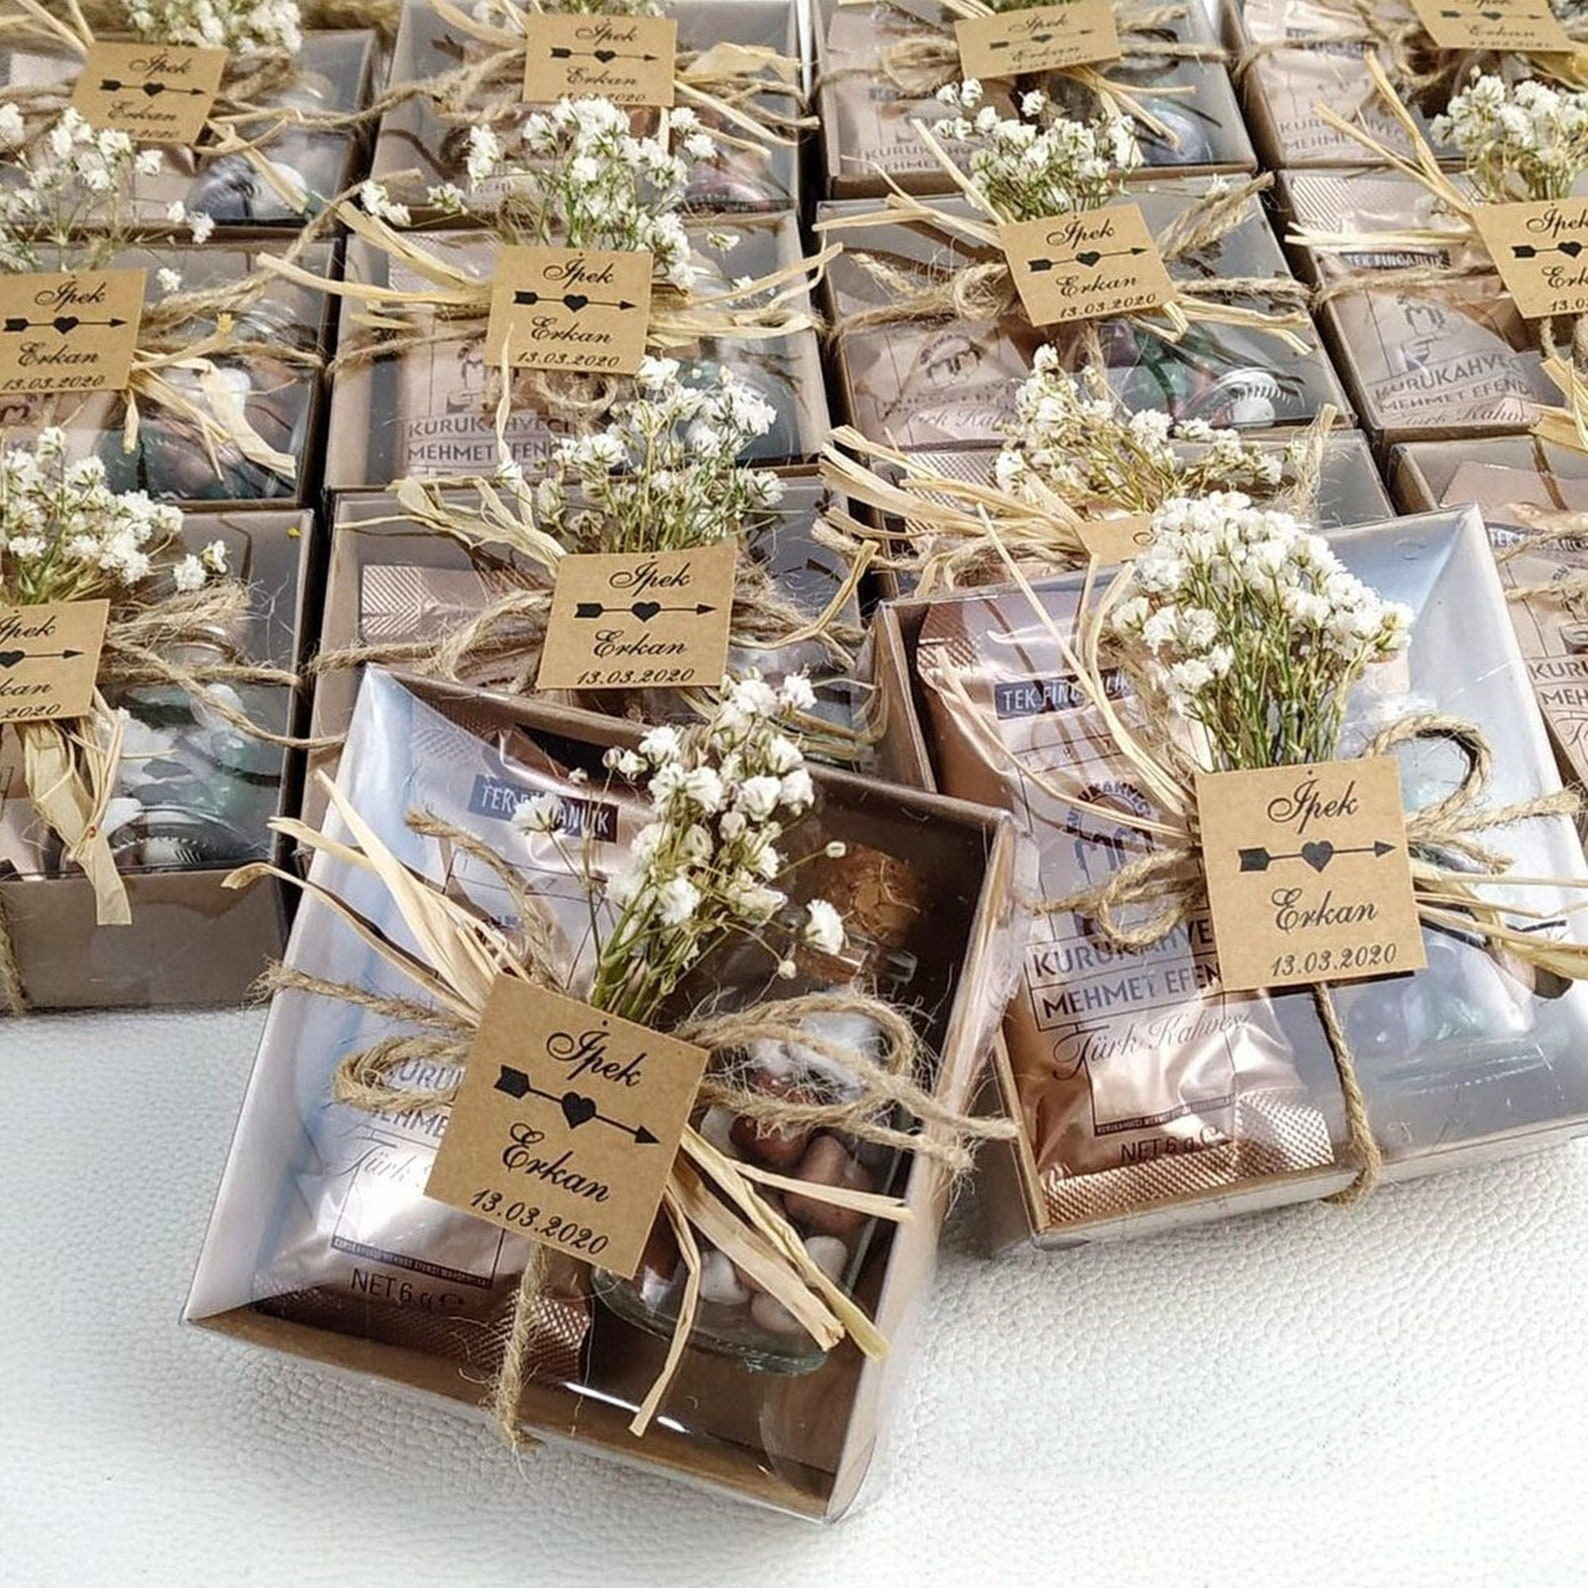 Affordable Edible Wedding Favors - Turkish Coffee and Pebble Chocolate Mini Favor Box